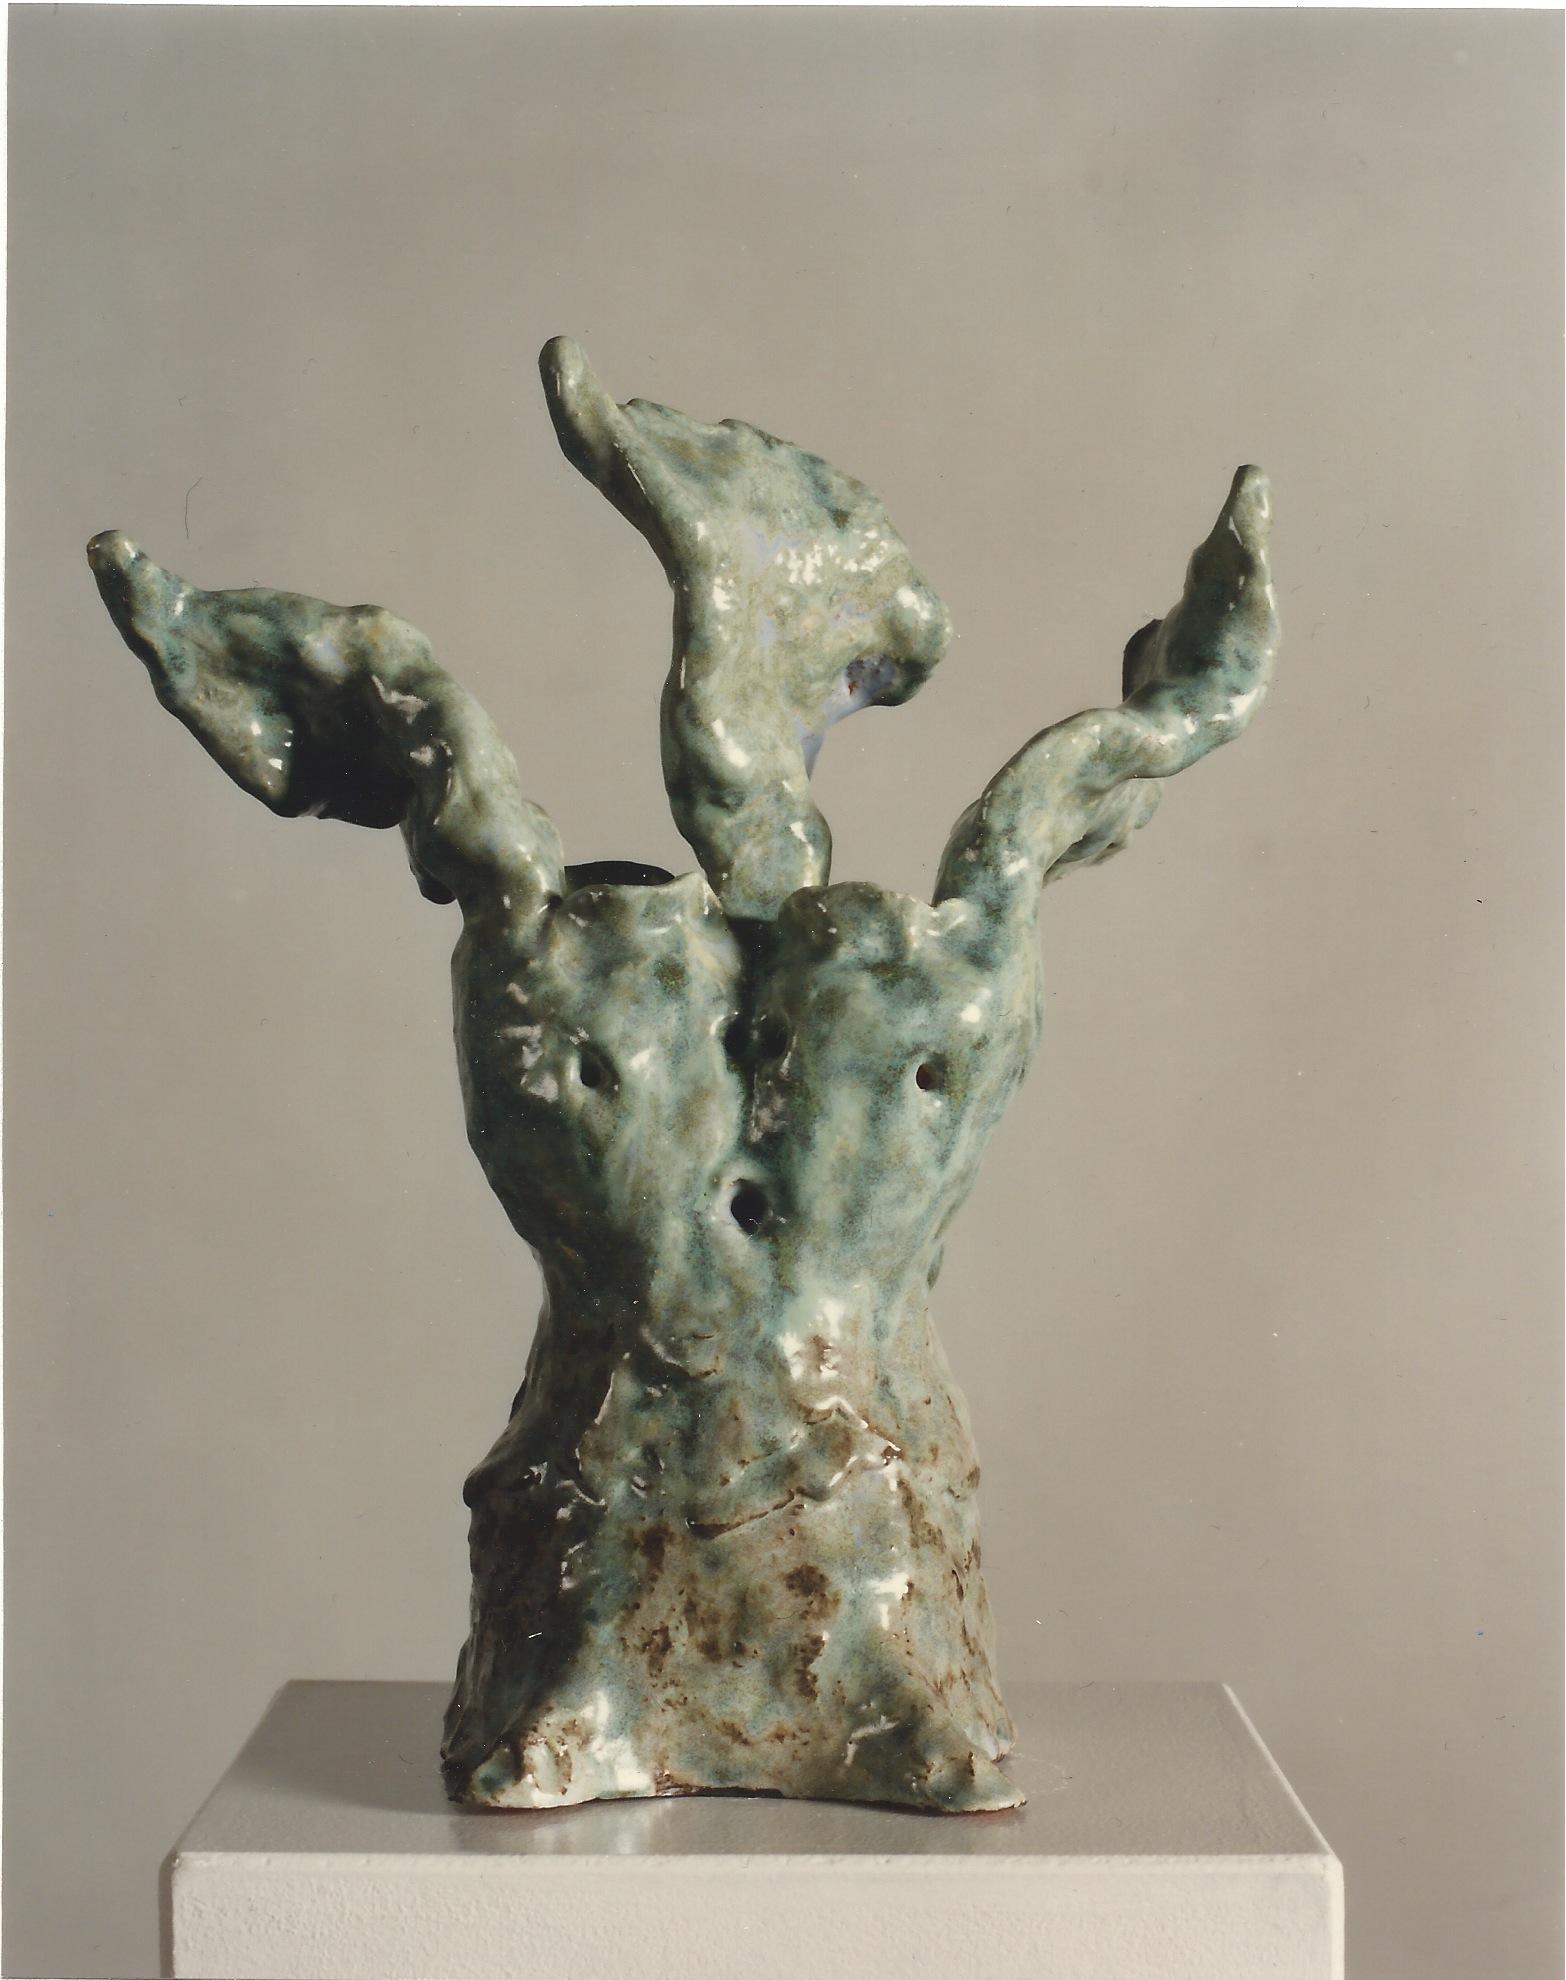 Janusköpfiger Engel, Keramik glasiert, 1997 (33,7 x 29 x 16,5 cm)